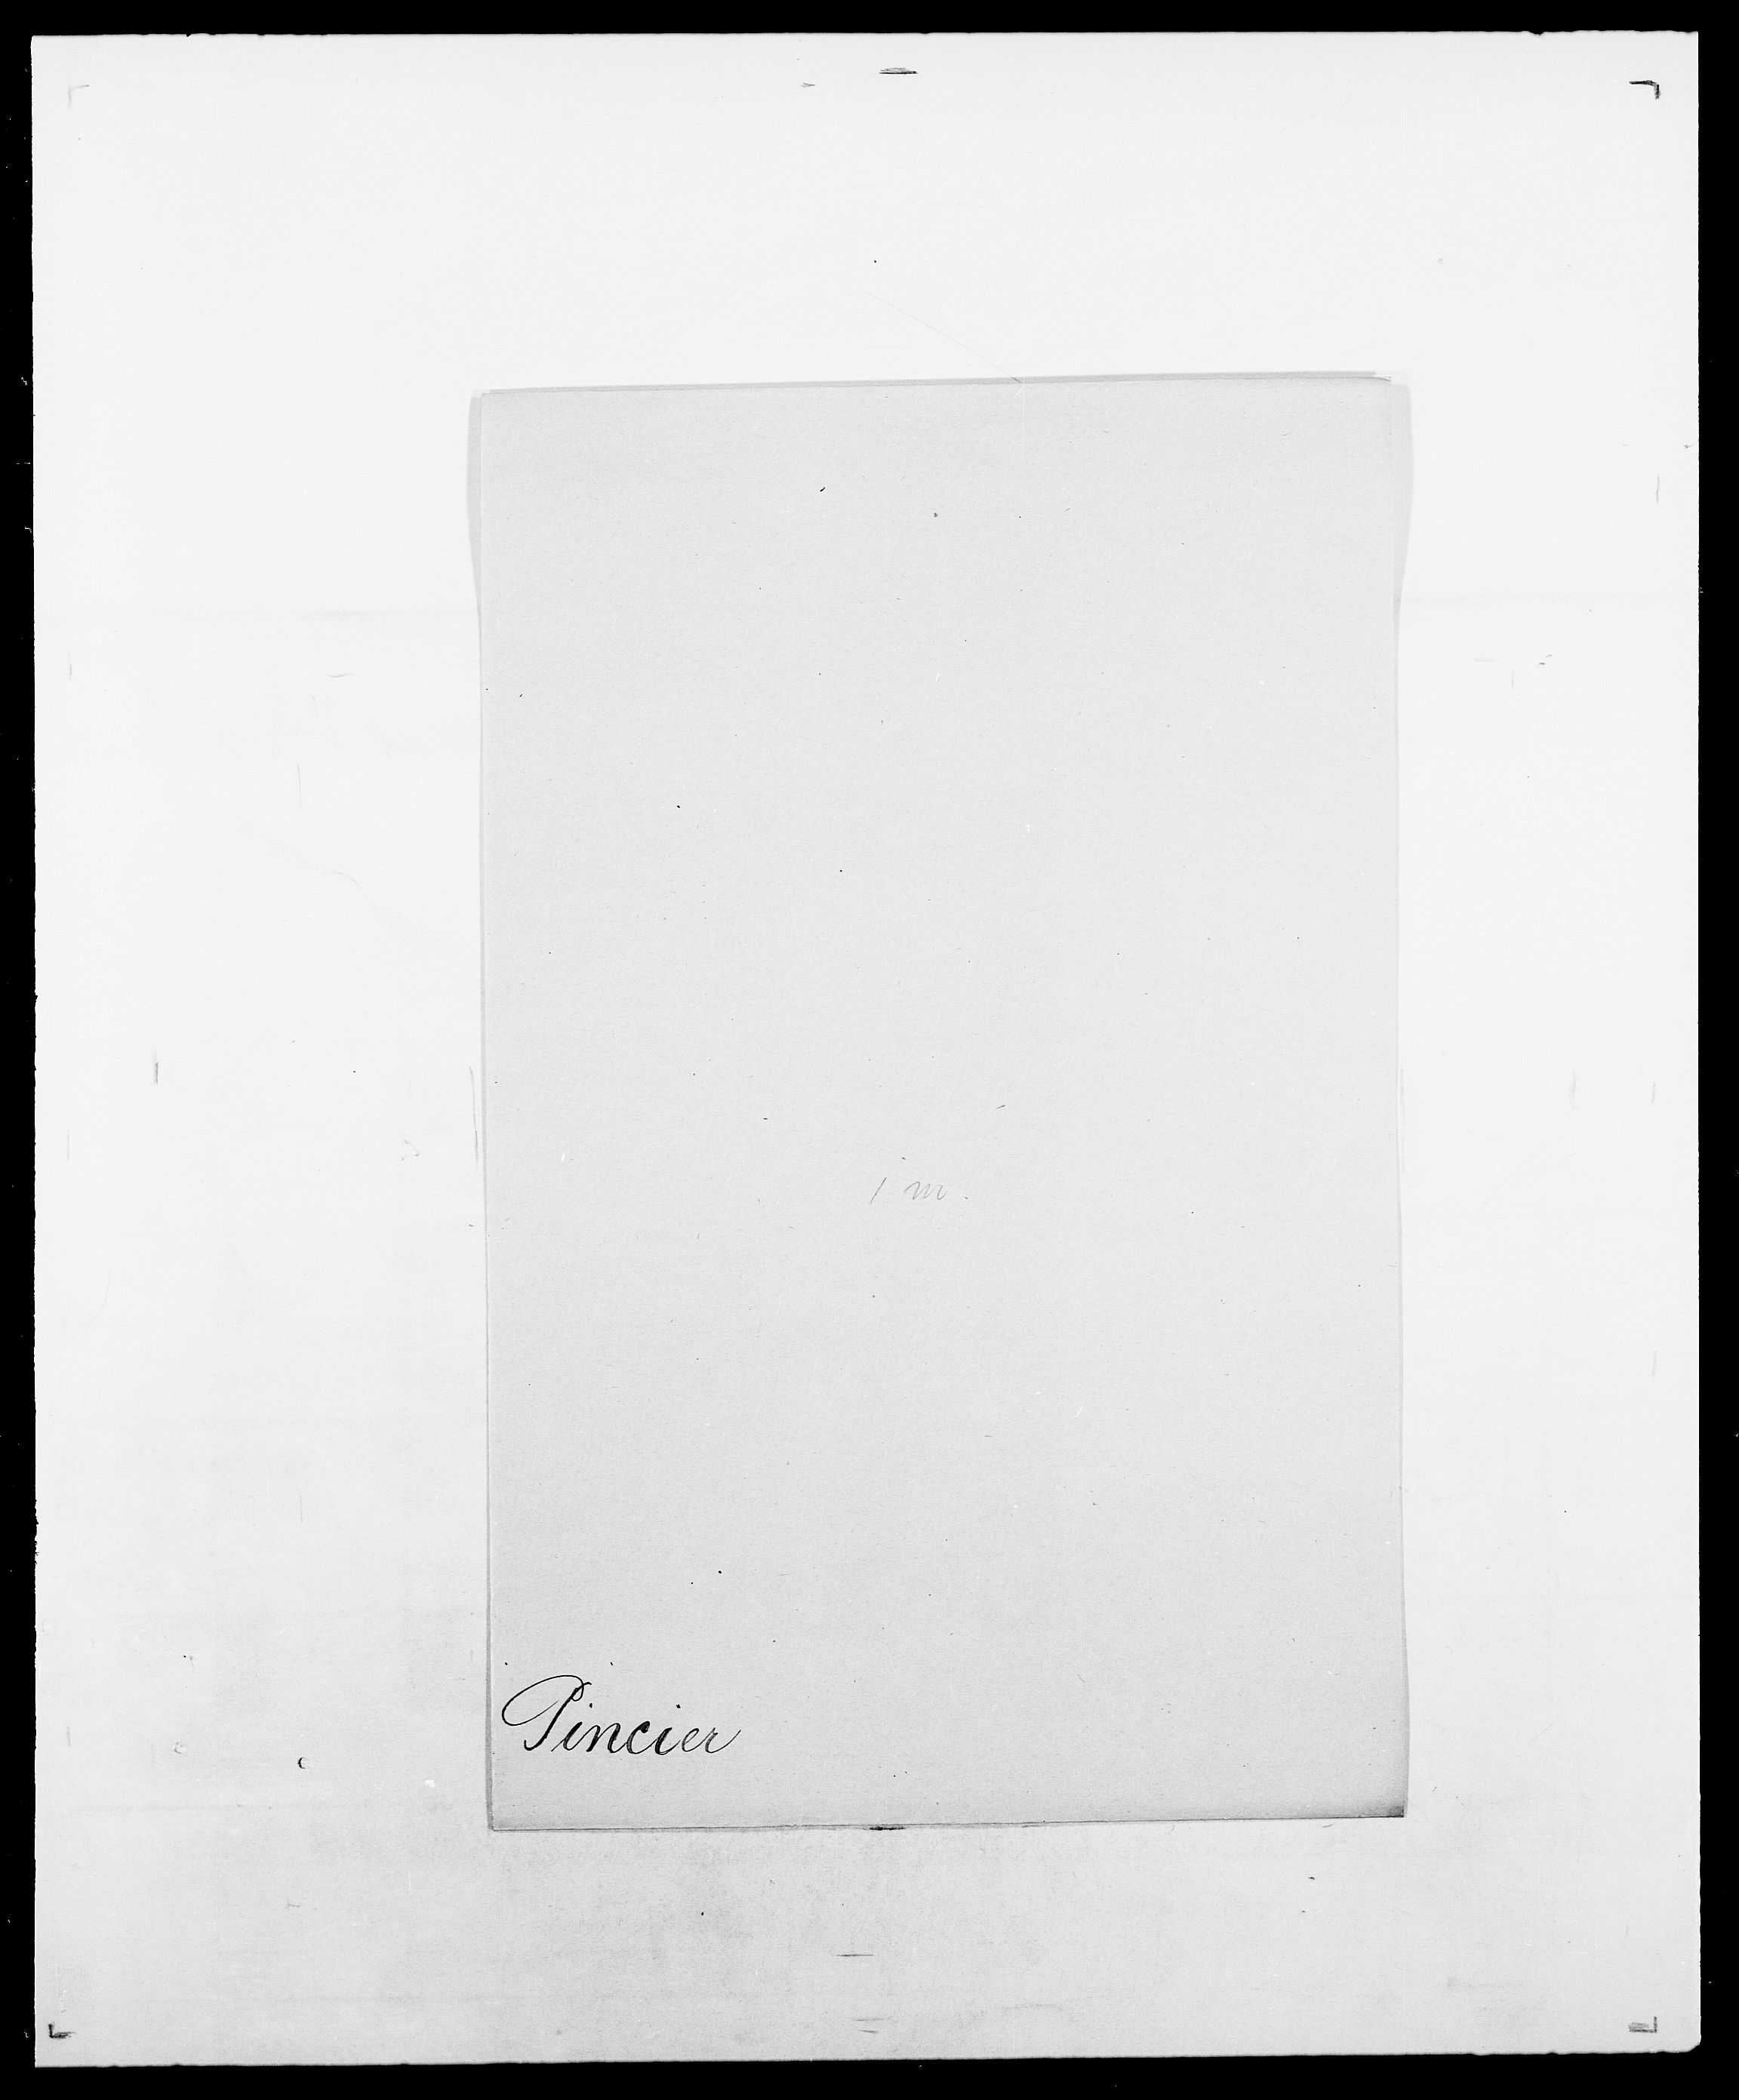 SAO, Delgobe, Charles Antoine - samling, D/Da/L0030: Paars - Pittelkov, s. 547